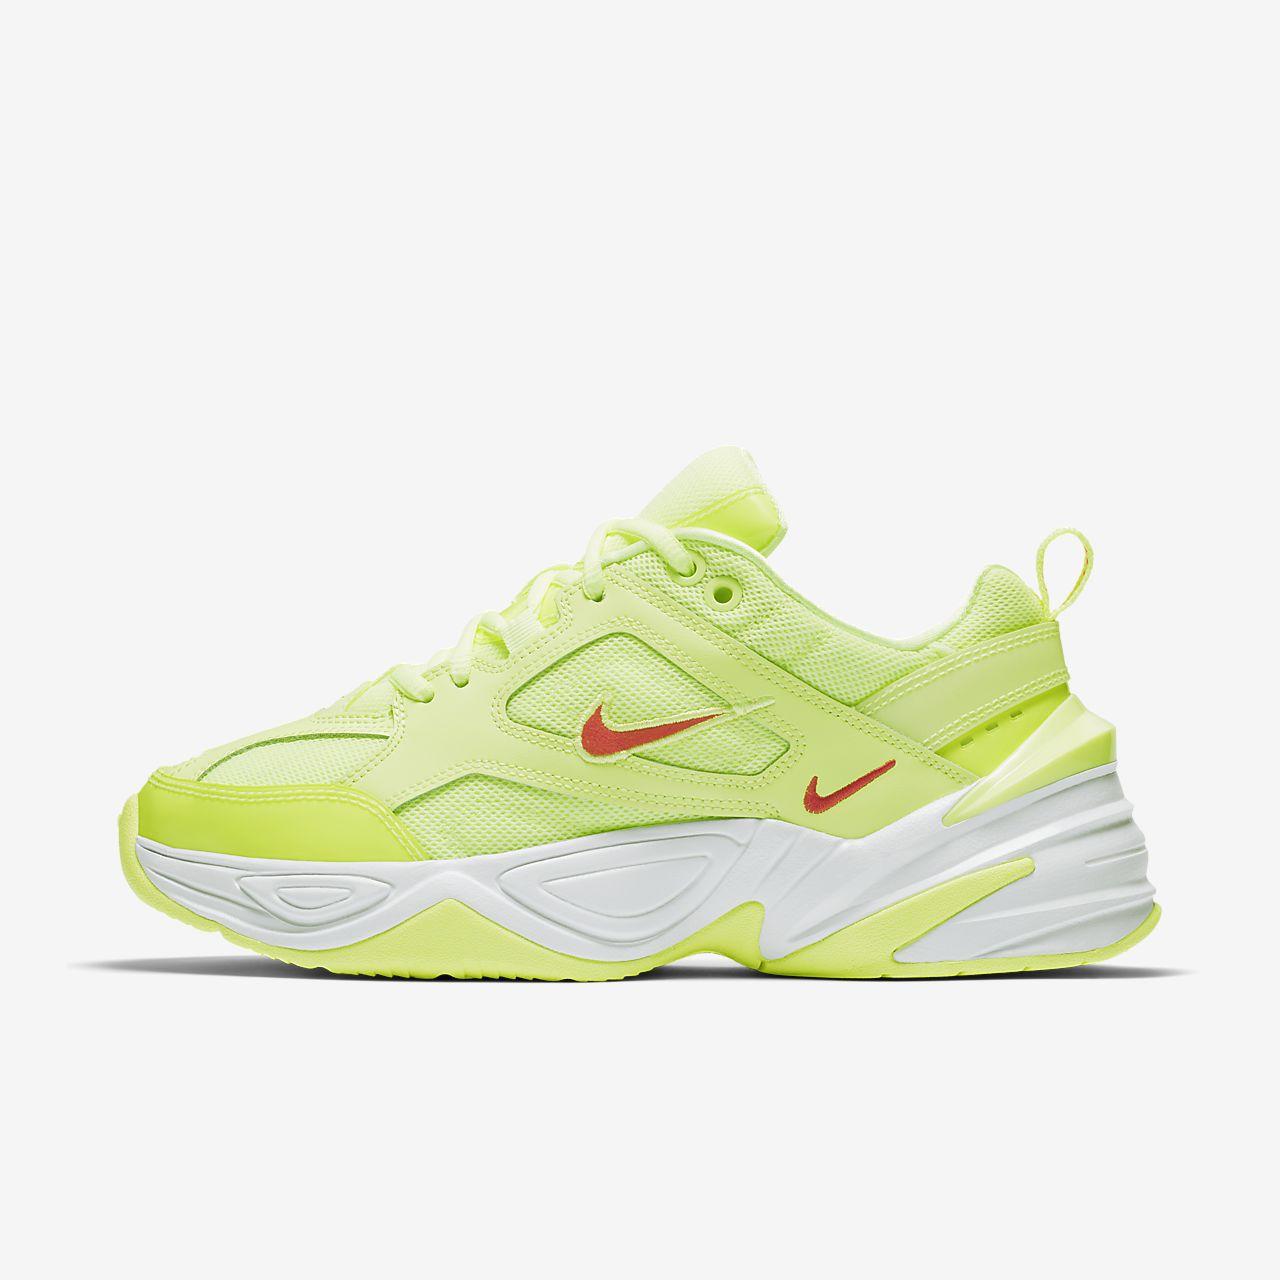 Nike M2K Tekno Damenschuh